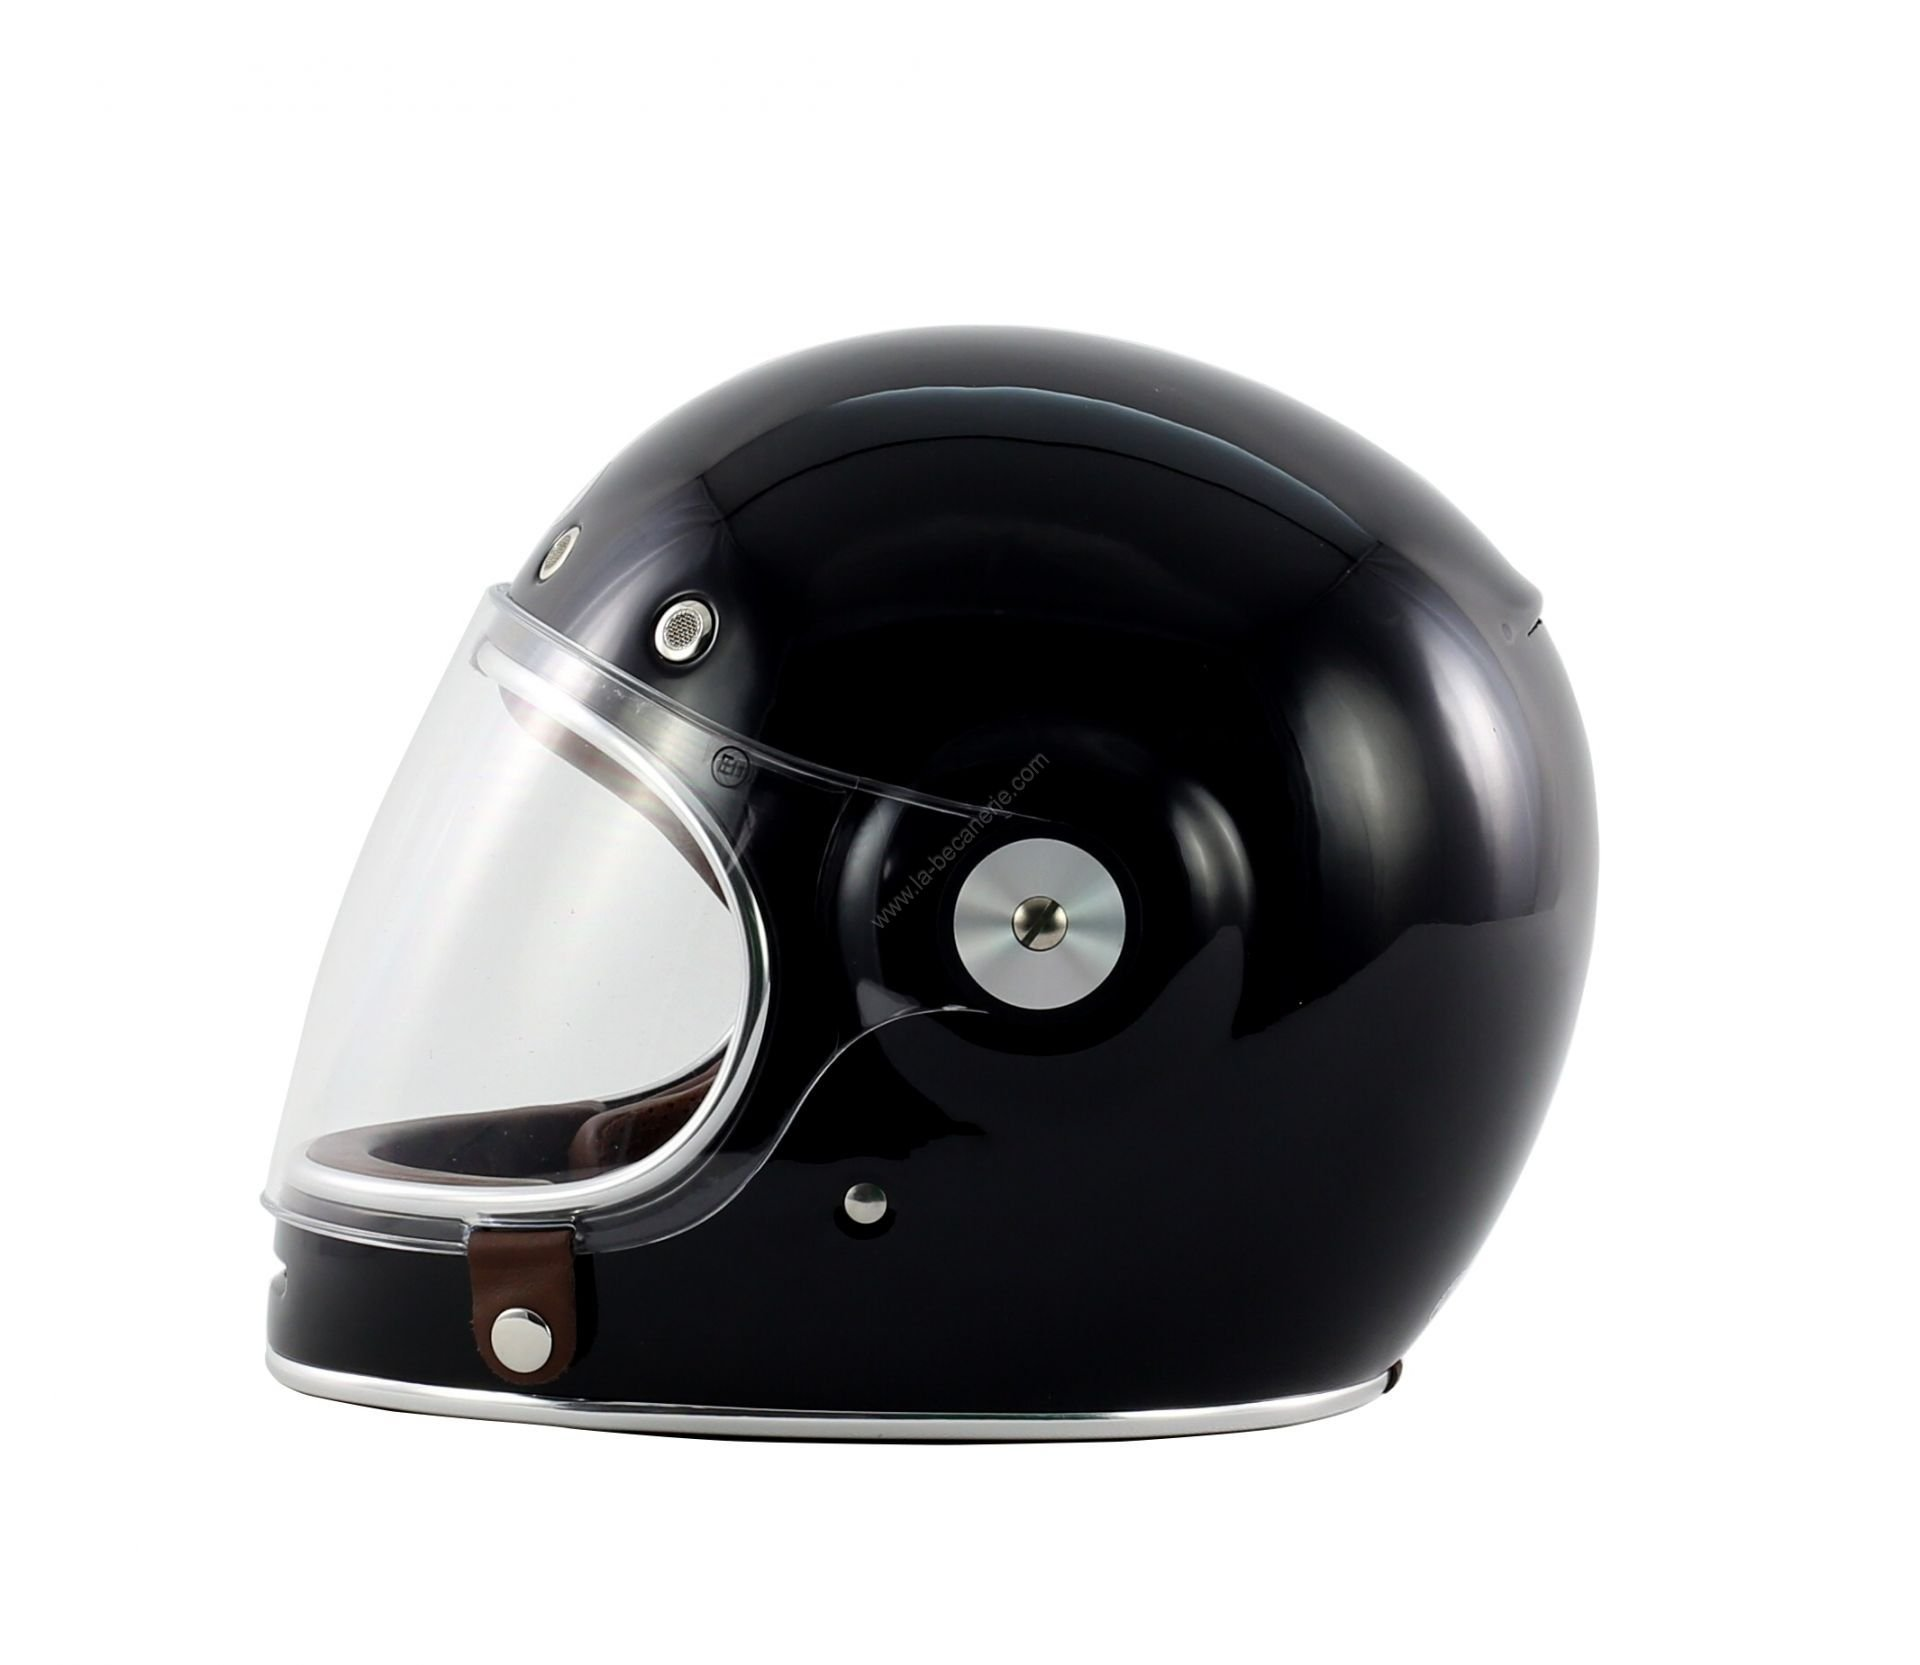 casque moto vintage bell casque moto custom. Black Bedroom Furniture Sets. Home Design Ideas